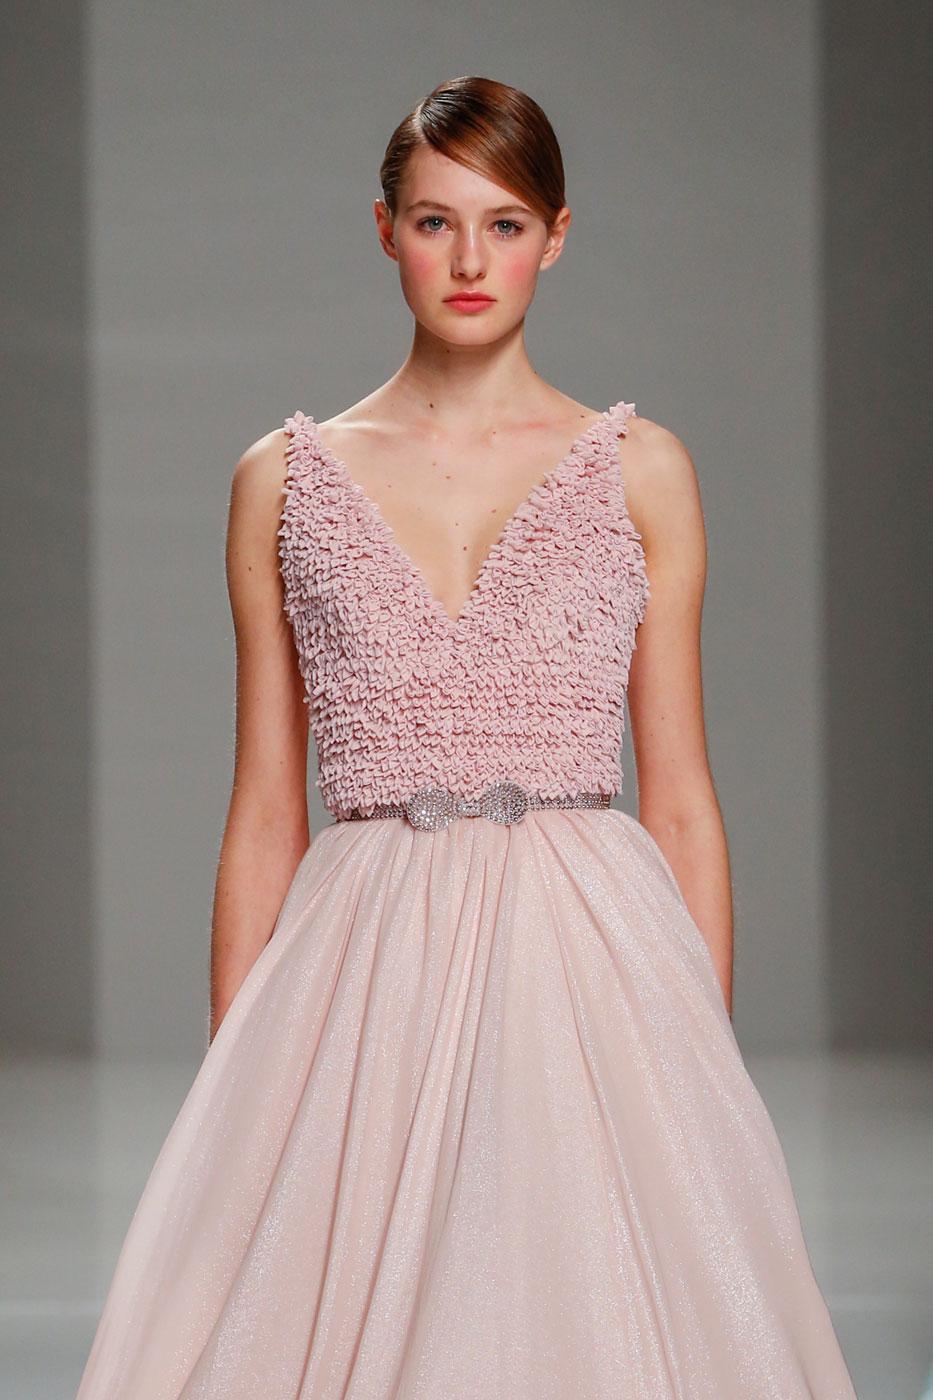 Georges-Hobeika-fashion-runway-show-haute-couture-paris-spring-2015-the-impression-44